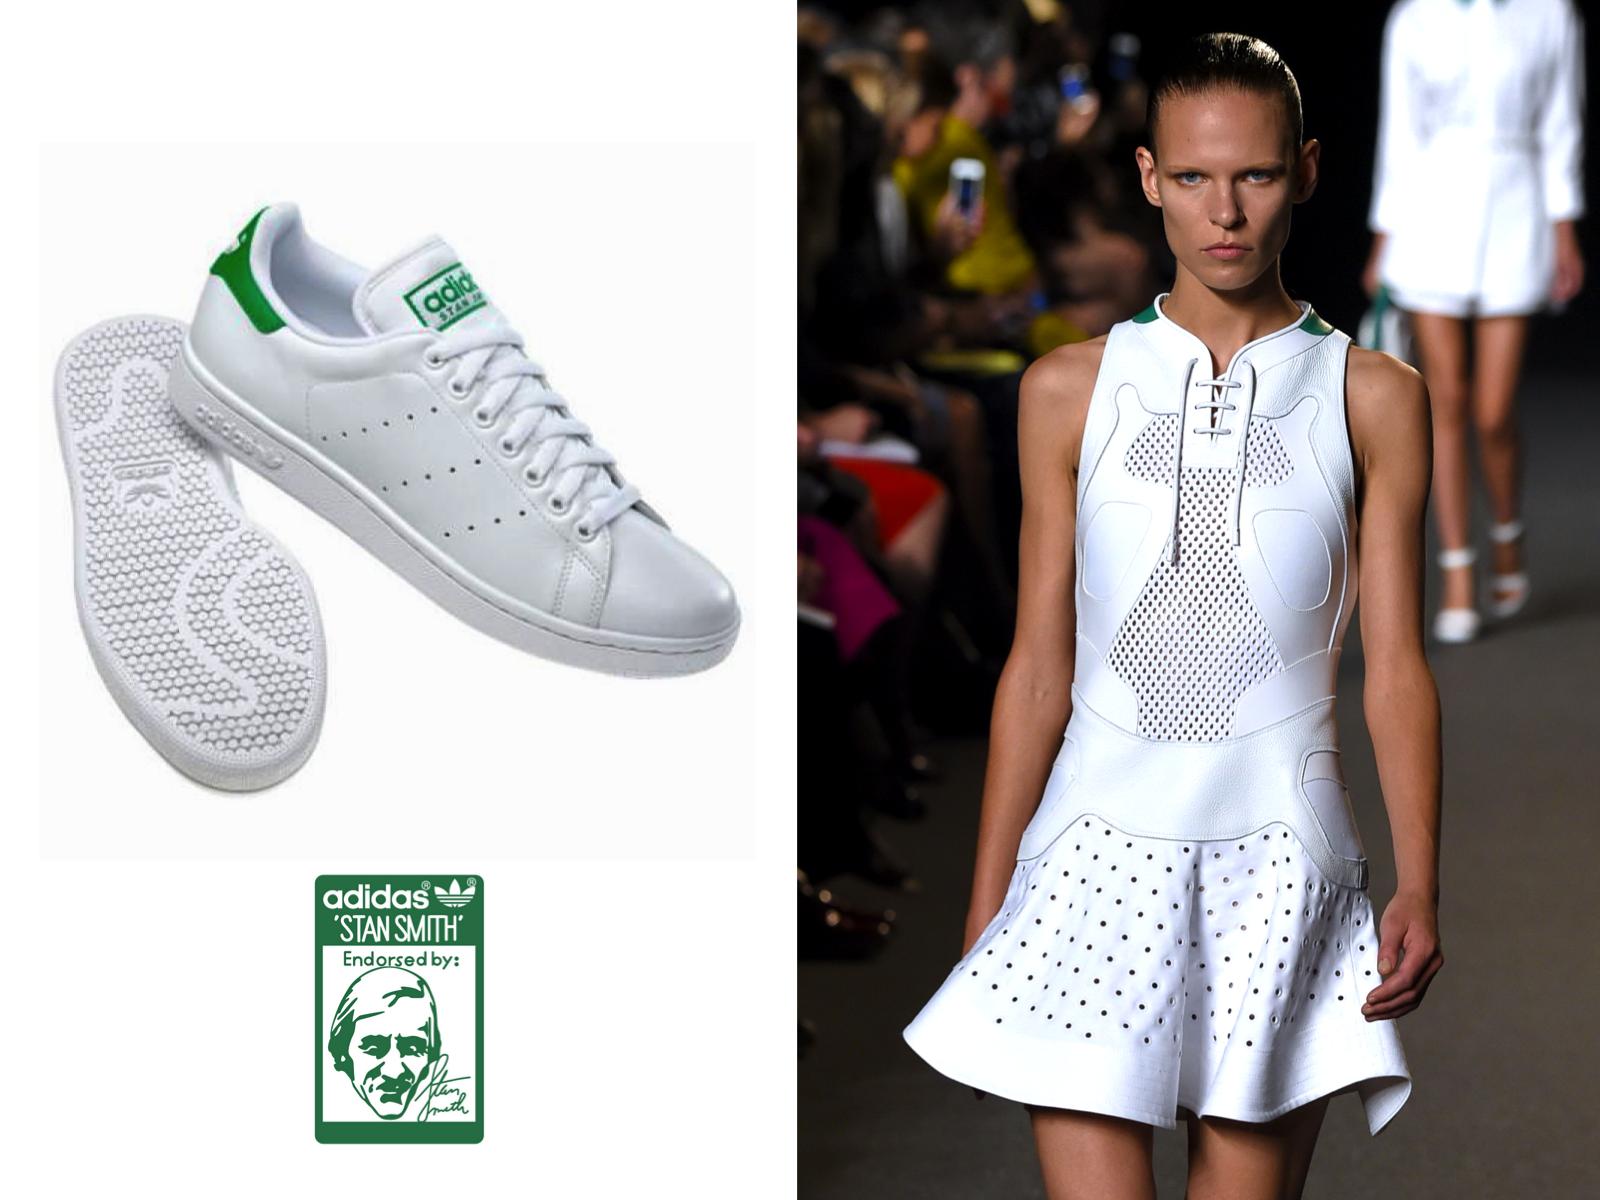 adidas 2015 model shoes